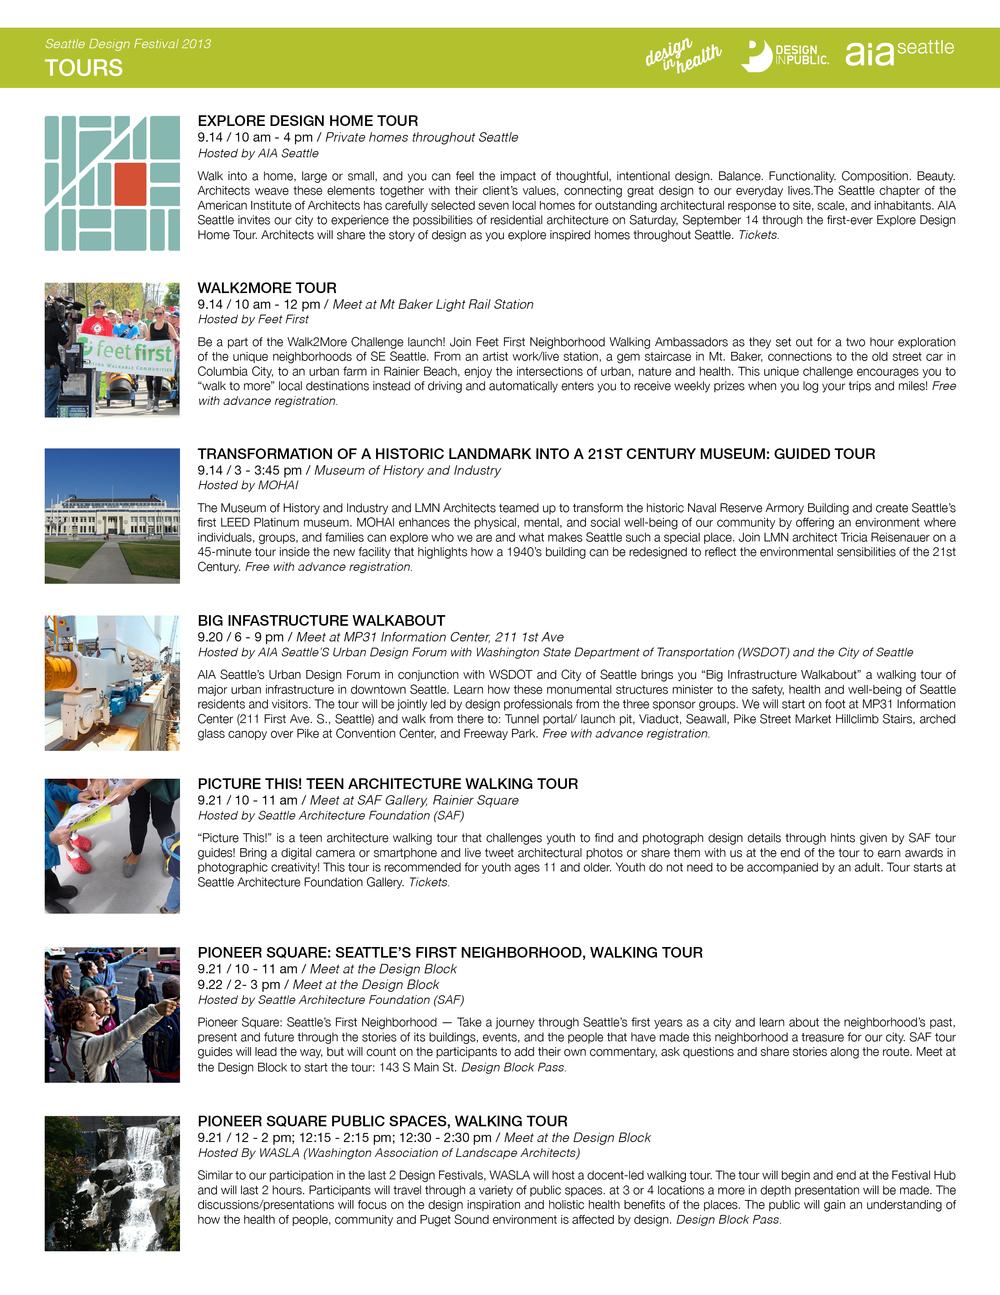 SDF13_festival program_of_events_web210.jpg